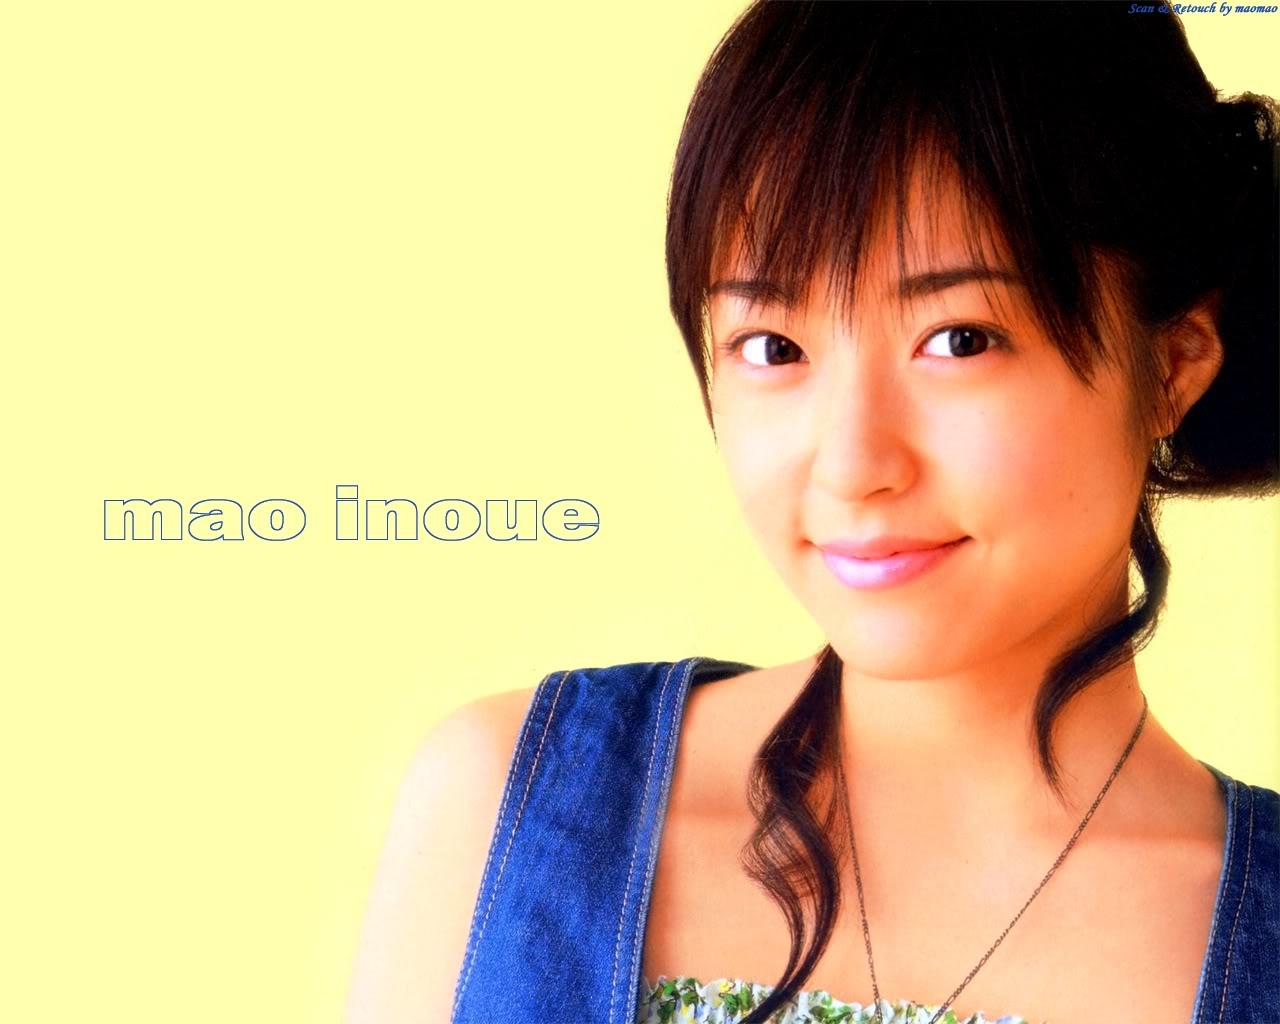 Mao Inoue Wallpaper - JAPANESE ARTIST WALLPAPER PHOTOBOOK VIDEO MUSIC ...